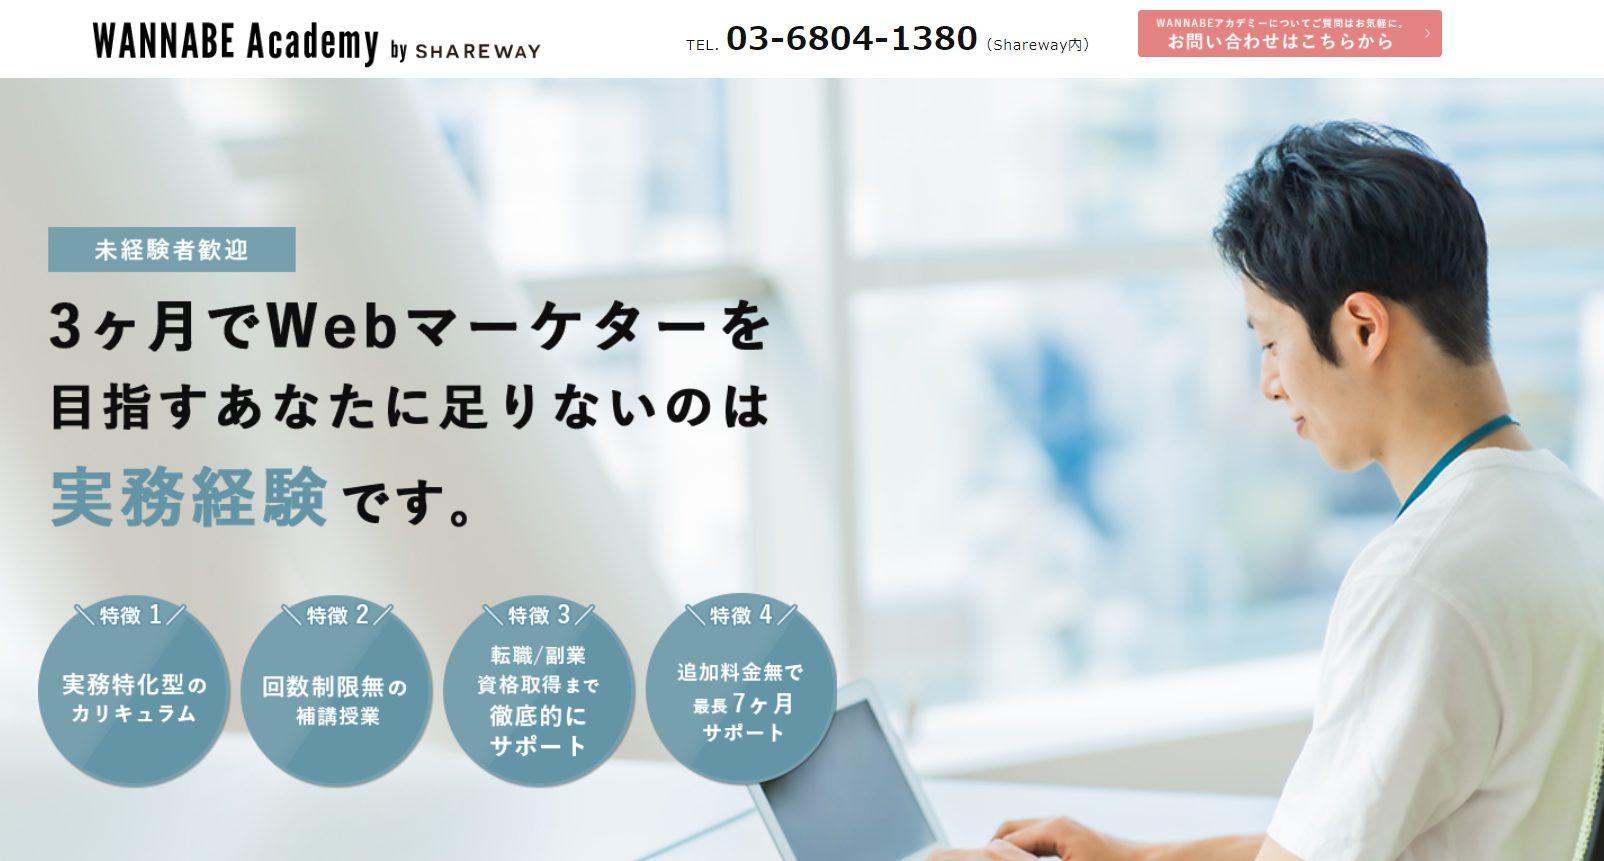 Wannabe Academyのトップページ